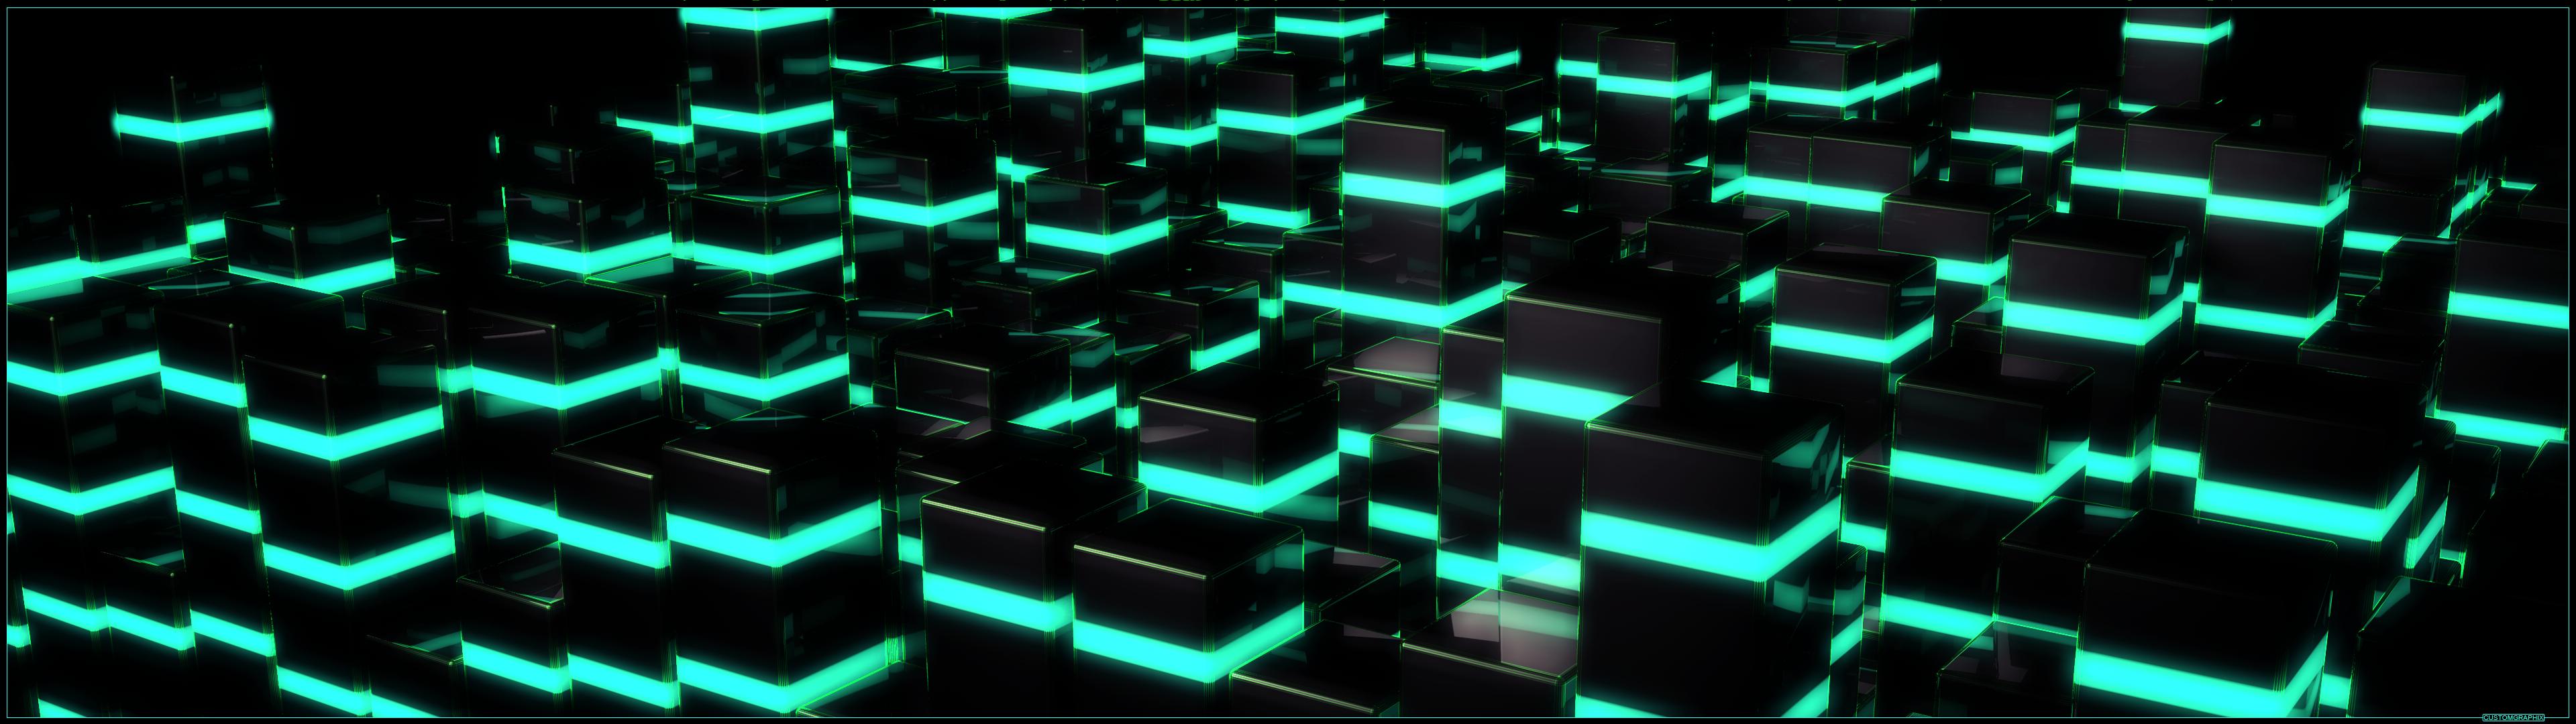 BestMovieWalls 15 3 UPDATED C4D Dualscreen wallpaper (3840x1080) by xCustomGraphix